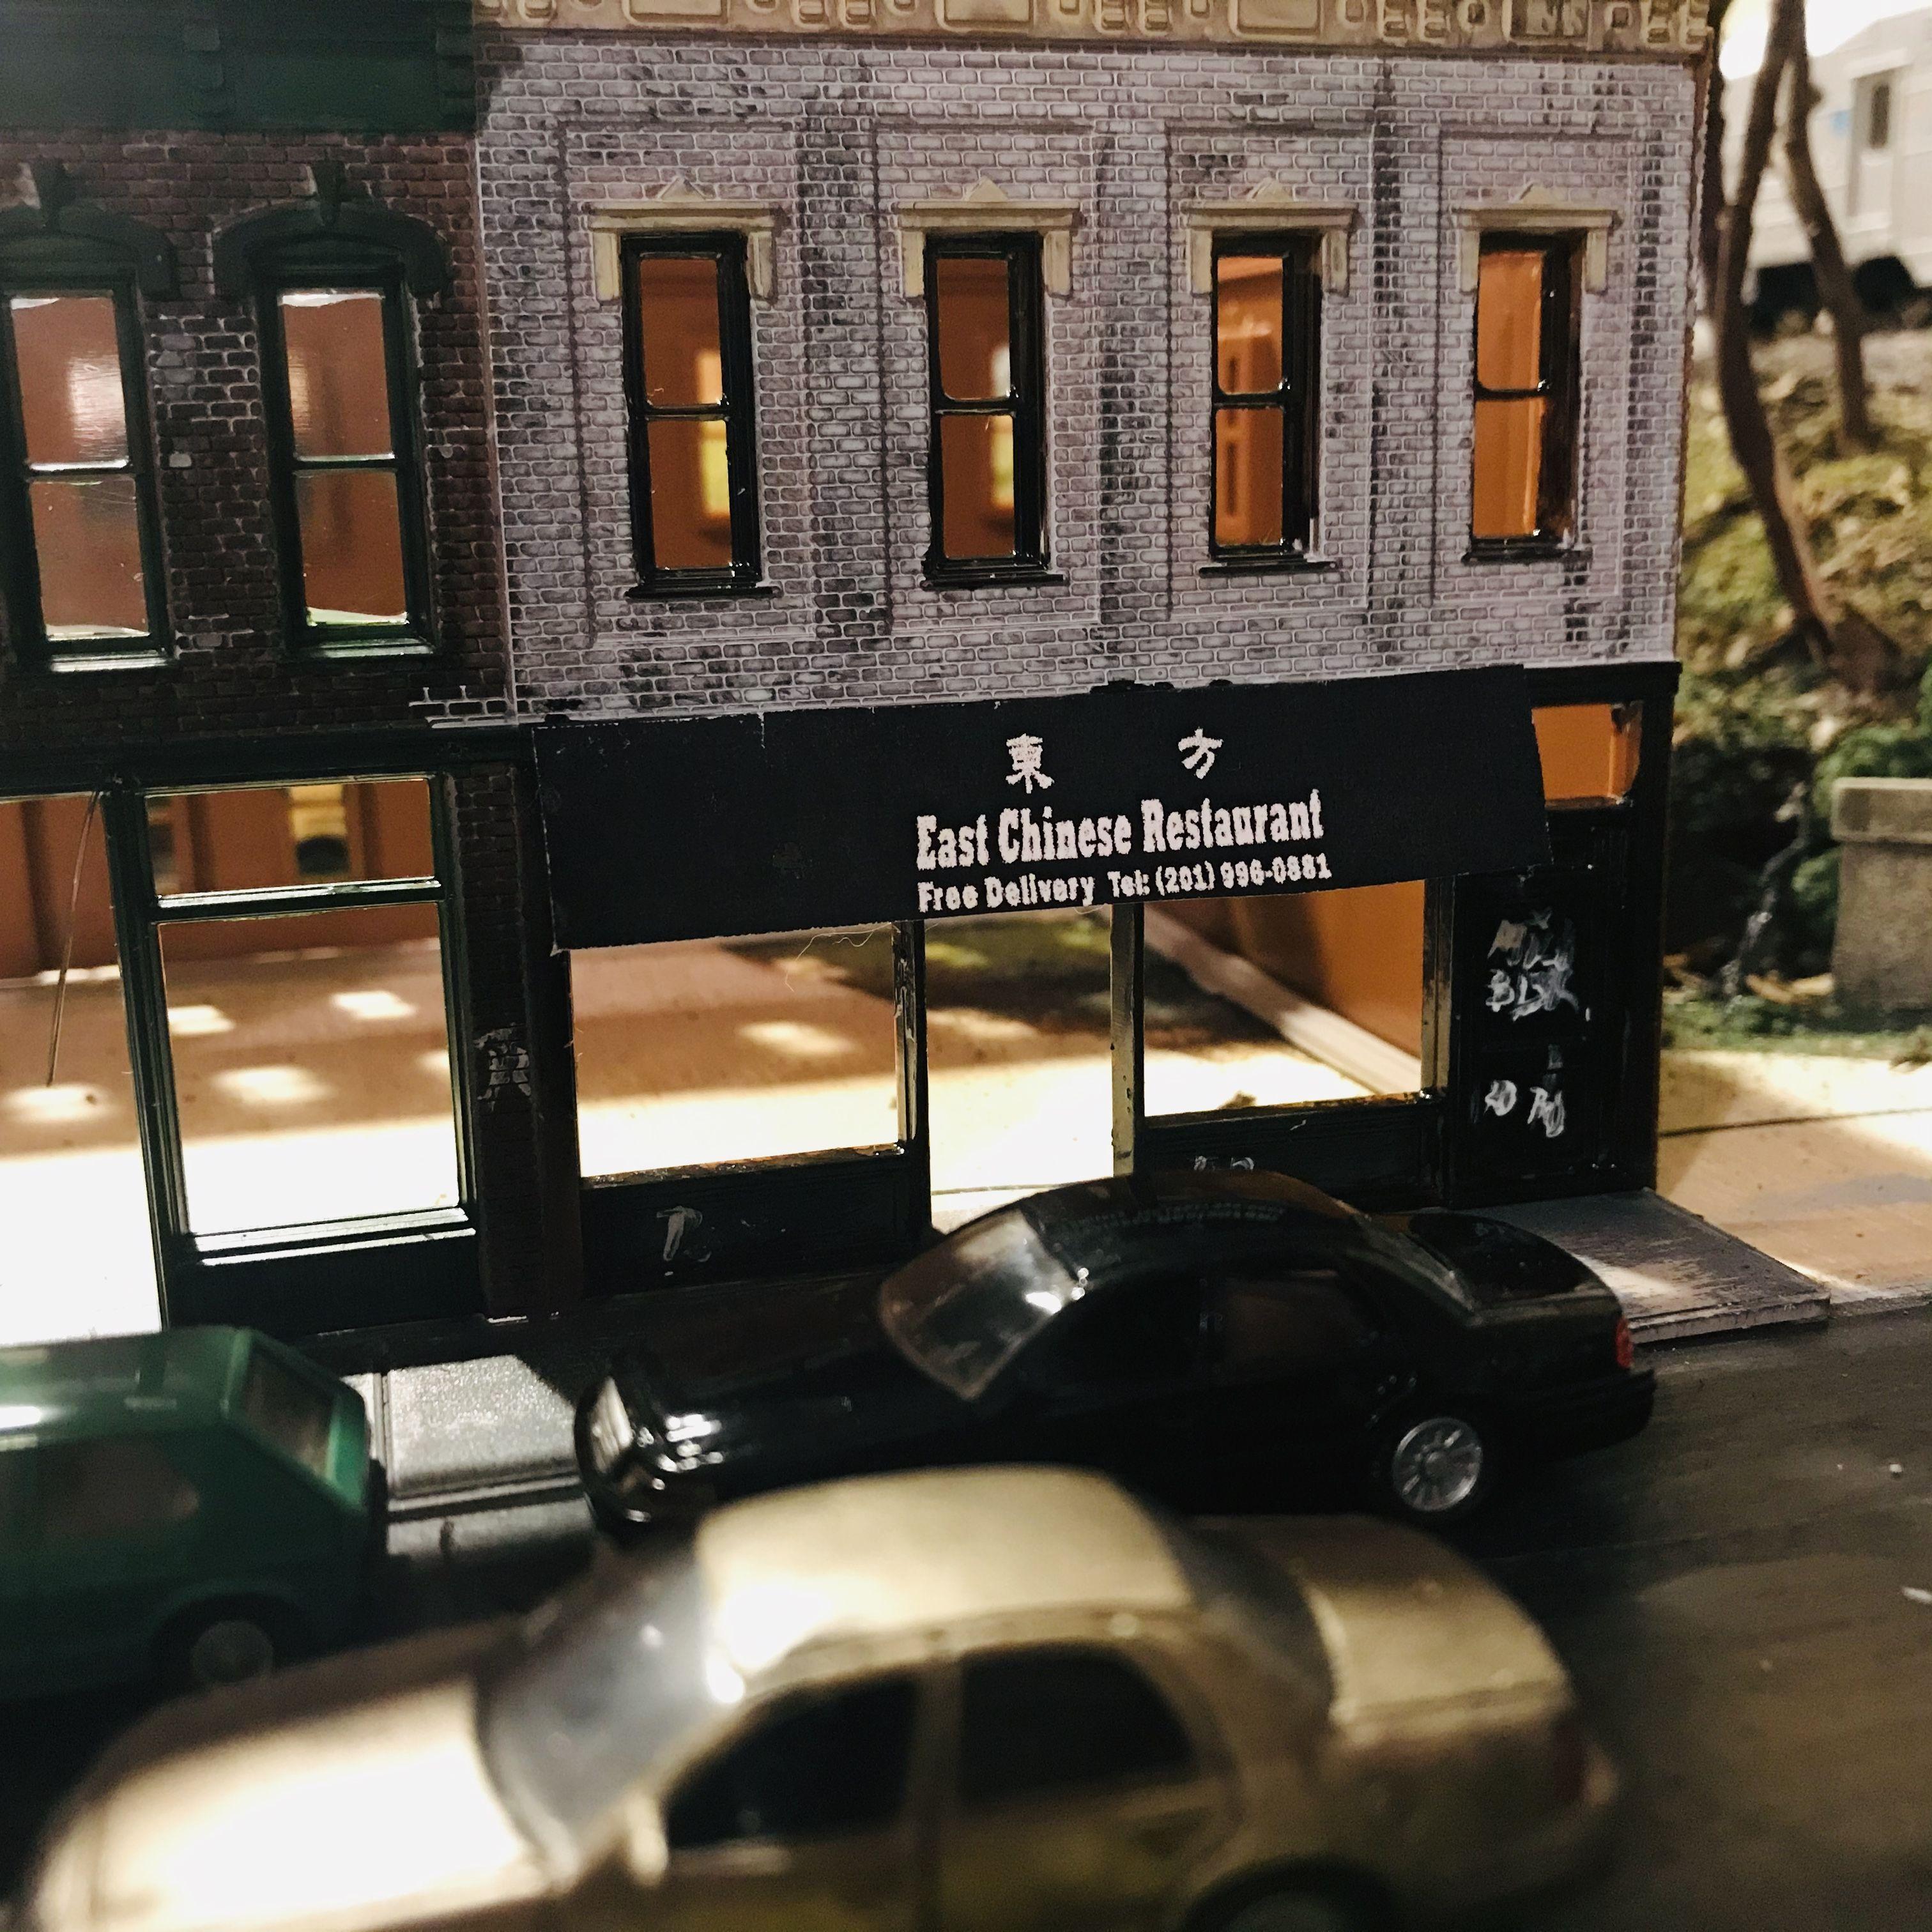 East Chinese Restaurant Hackensack Nj In 2020 Chinese Restaurant Hackensack Nj Model Railroad